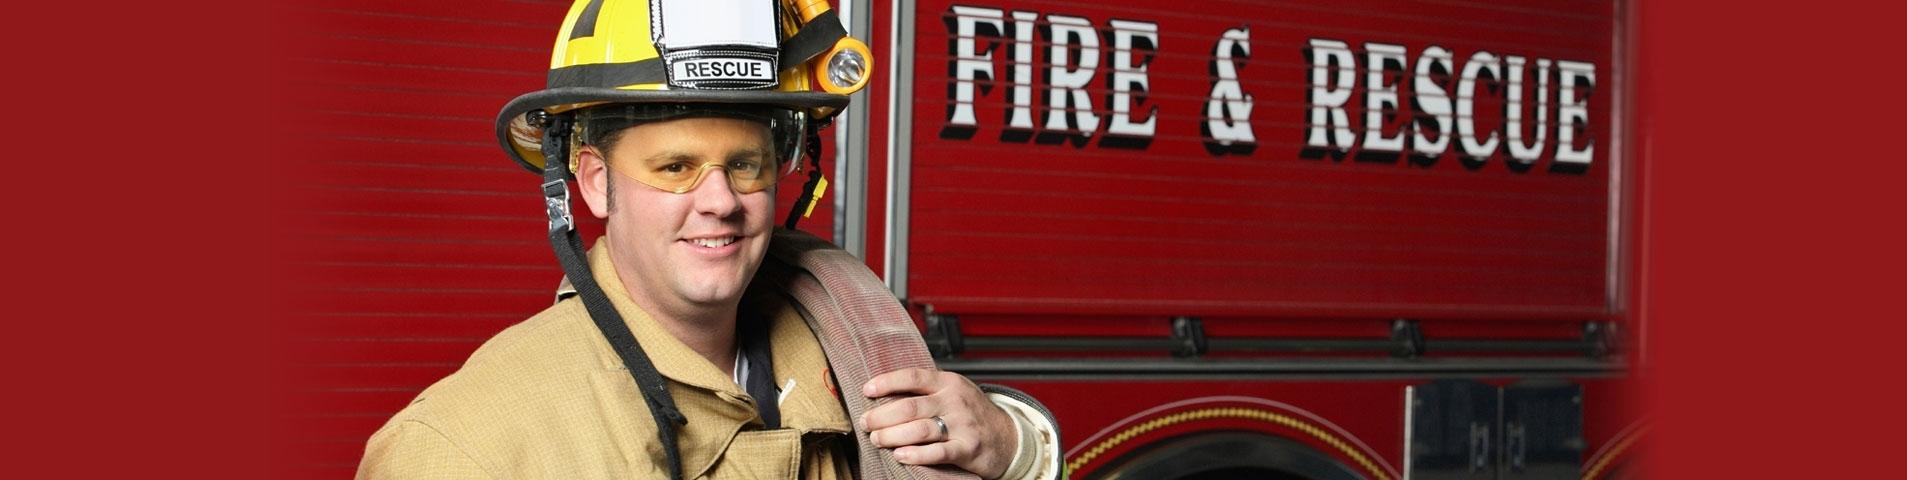 Fire Department Shift Scheduling Software | Snap Schedule for 48 Hours Fire Shift Schedule